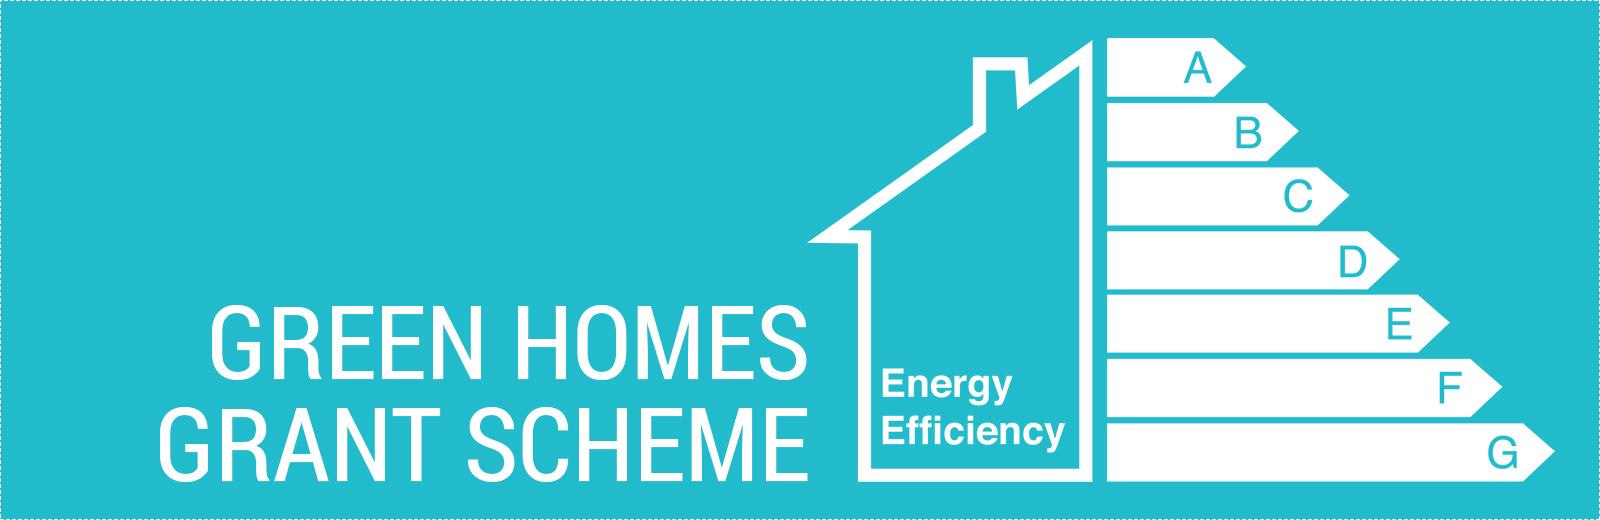 Green Home Grant scheme